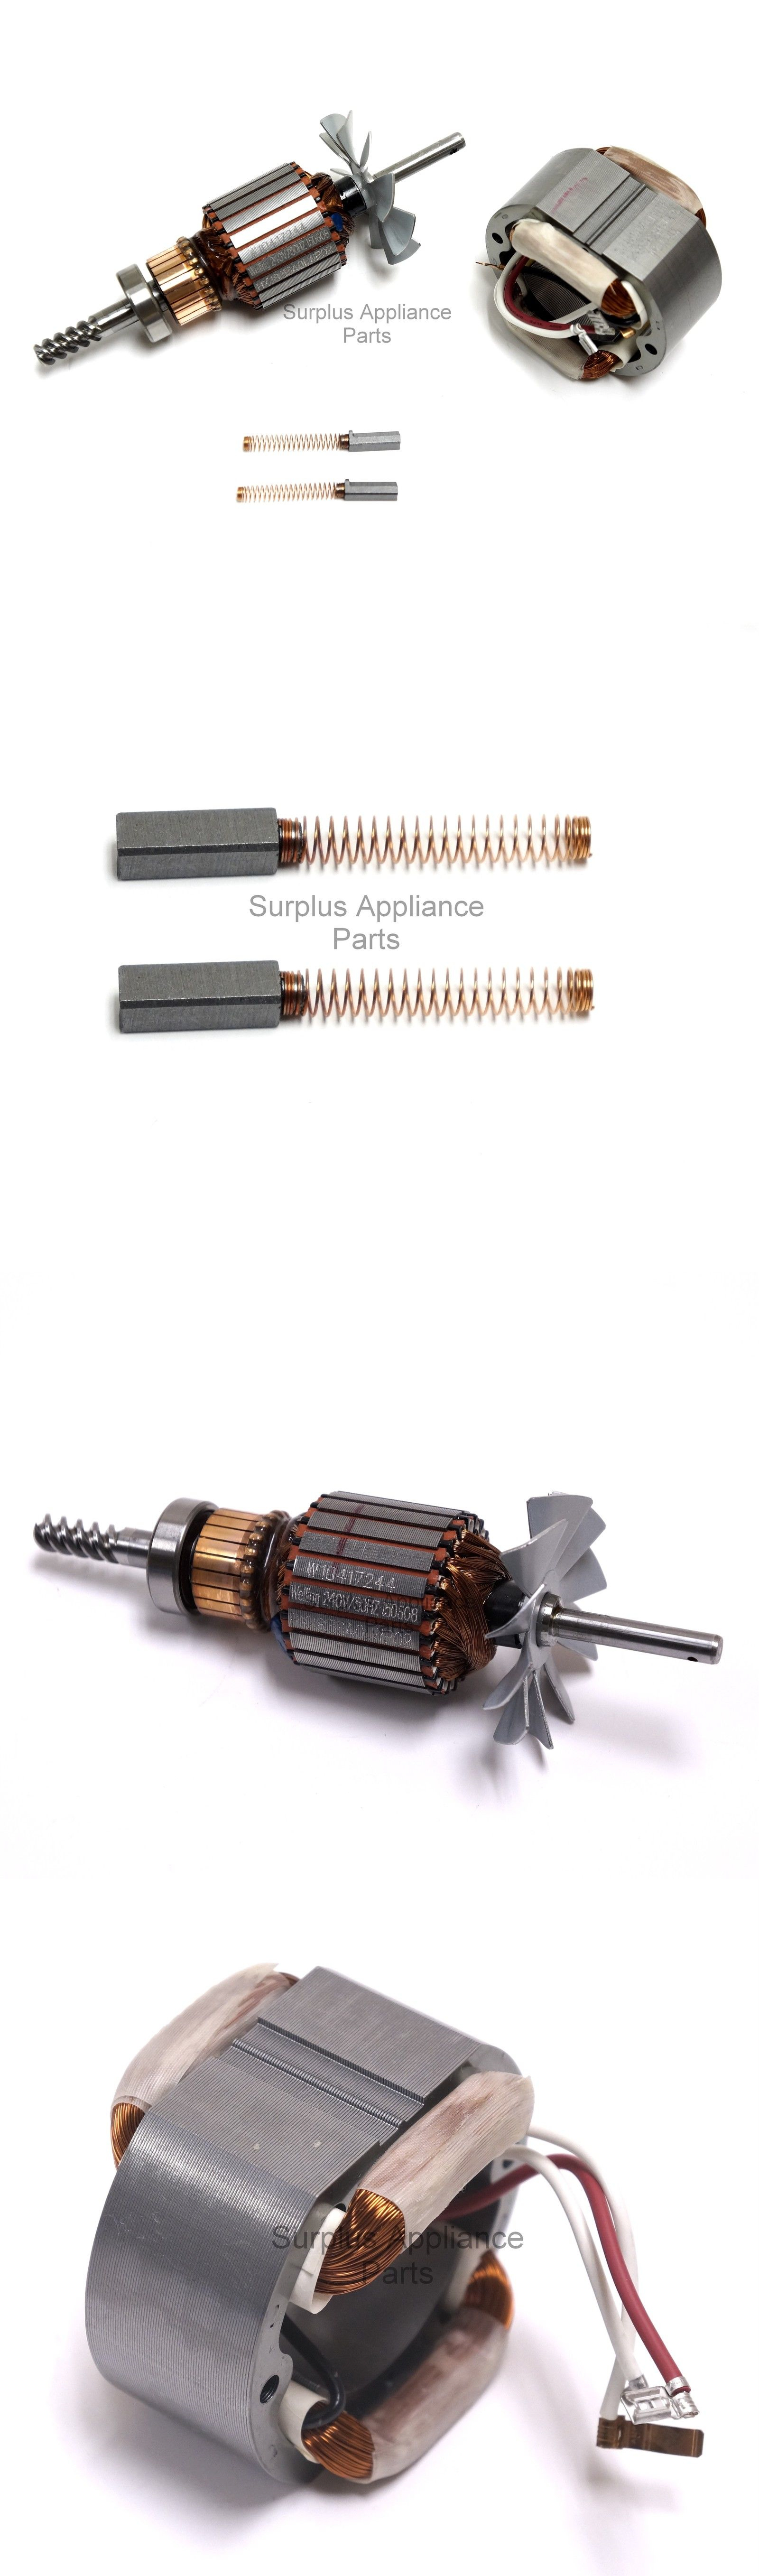 mixers countertop kitchenaid artisan and 5qt stand mixer 220240v motor armature replacement - Kitchenaid Artisan 5qt Stand Mixer